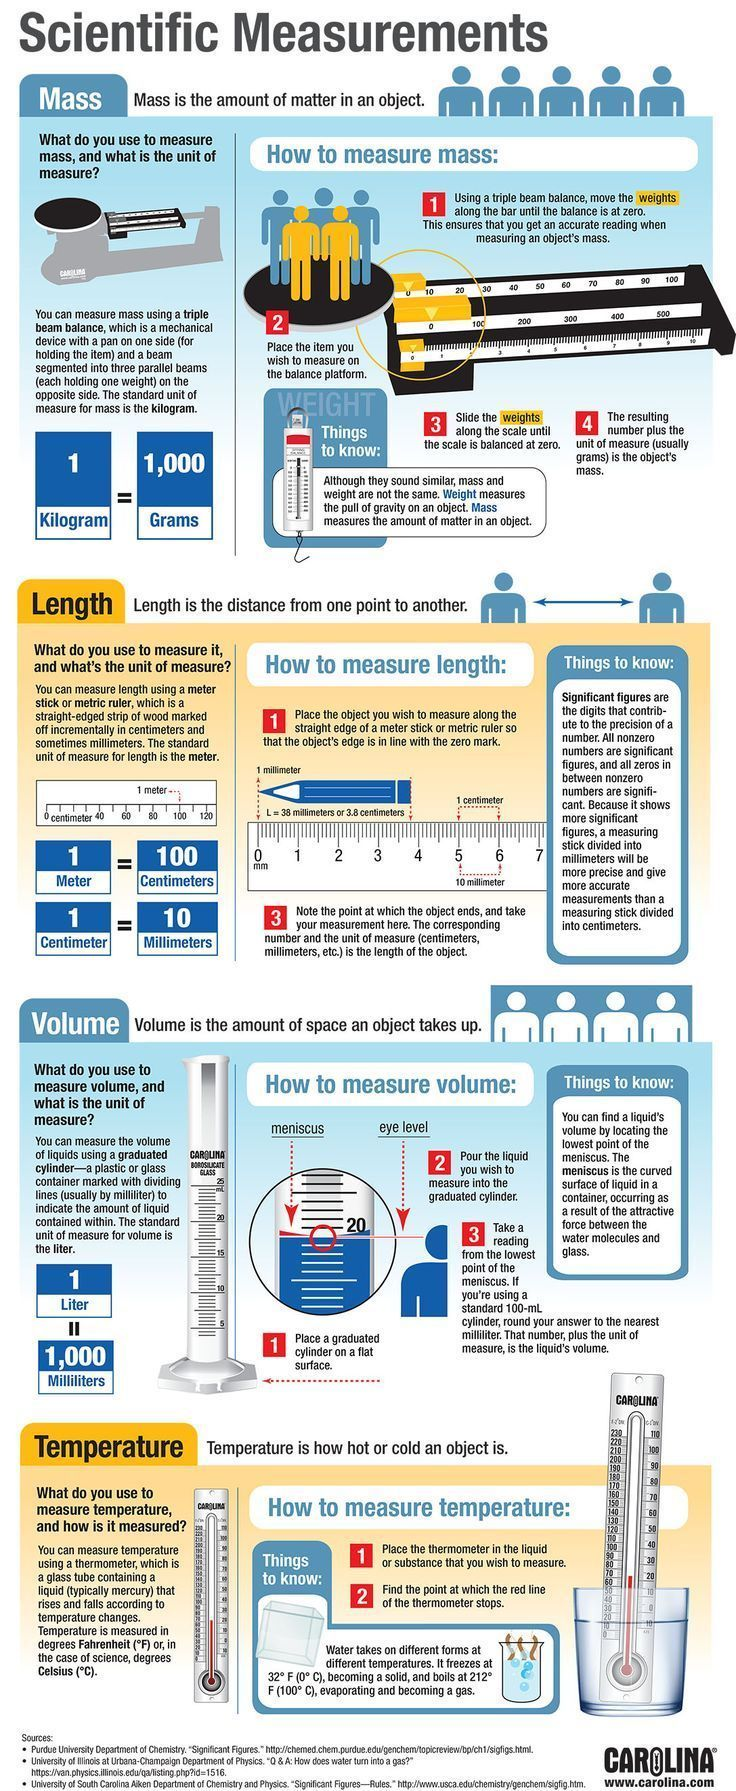 Infographic: Scientific Measurements